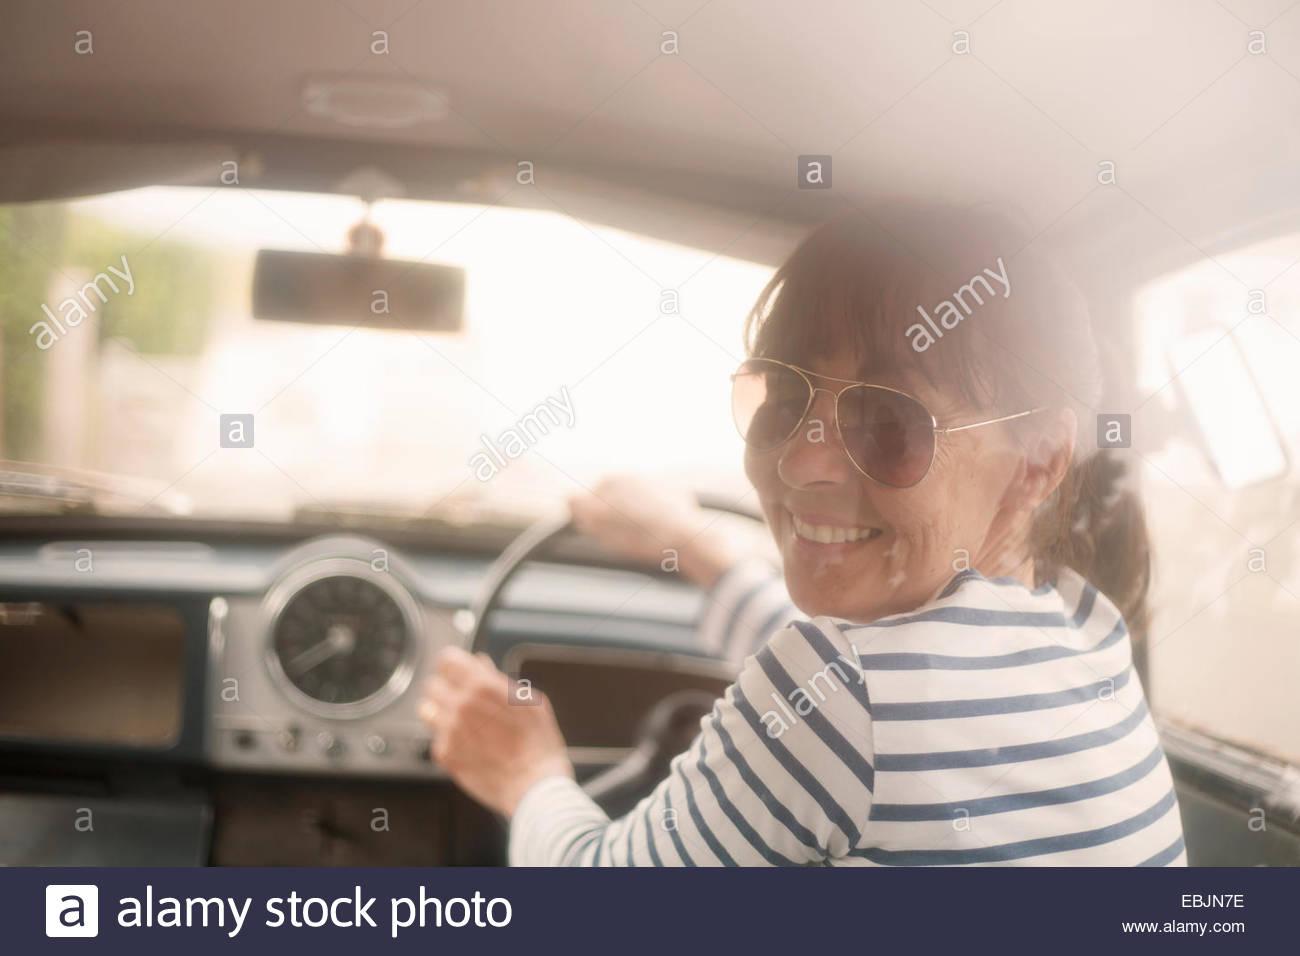 Mujer conduciendo un coche, sonriendo Imagen De Stock